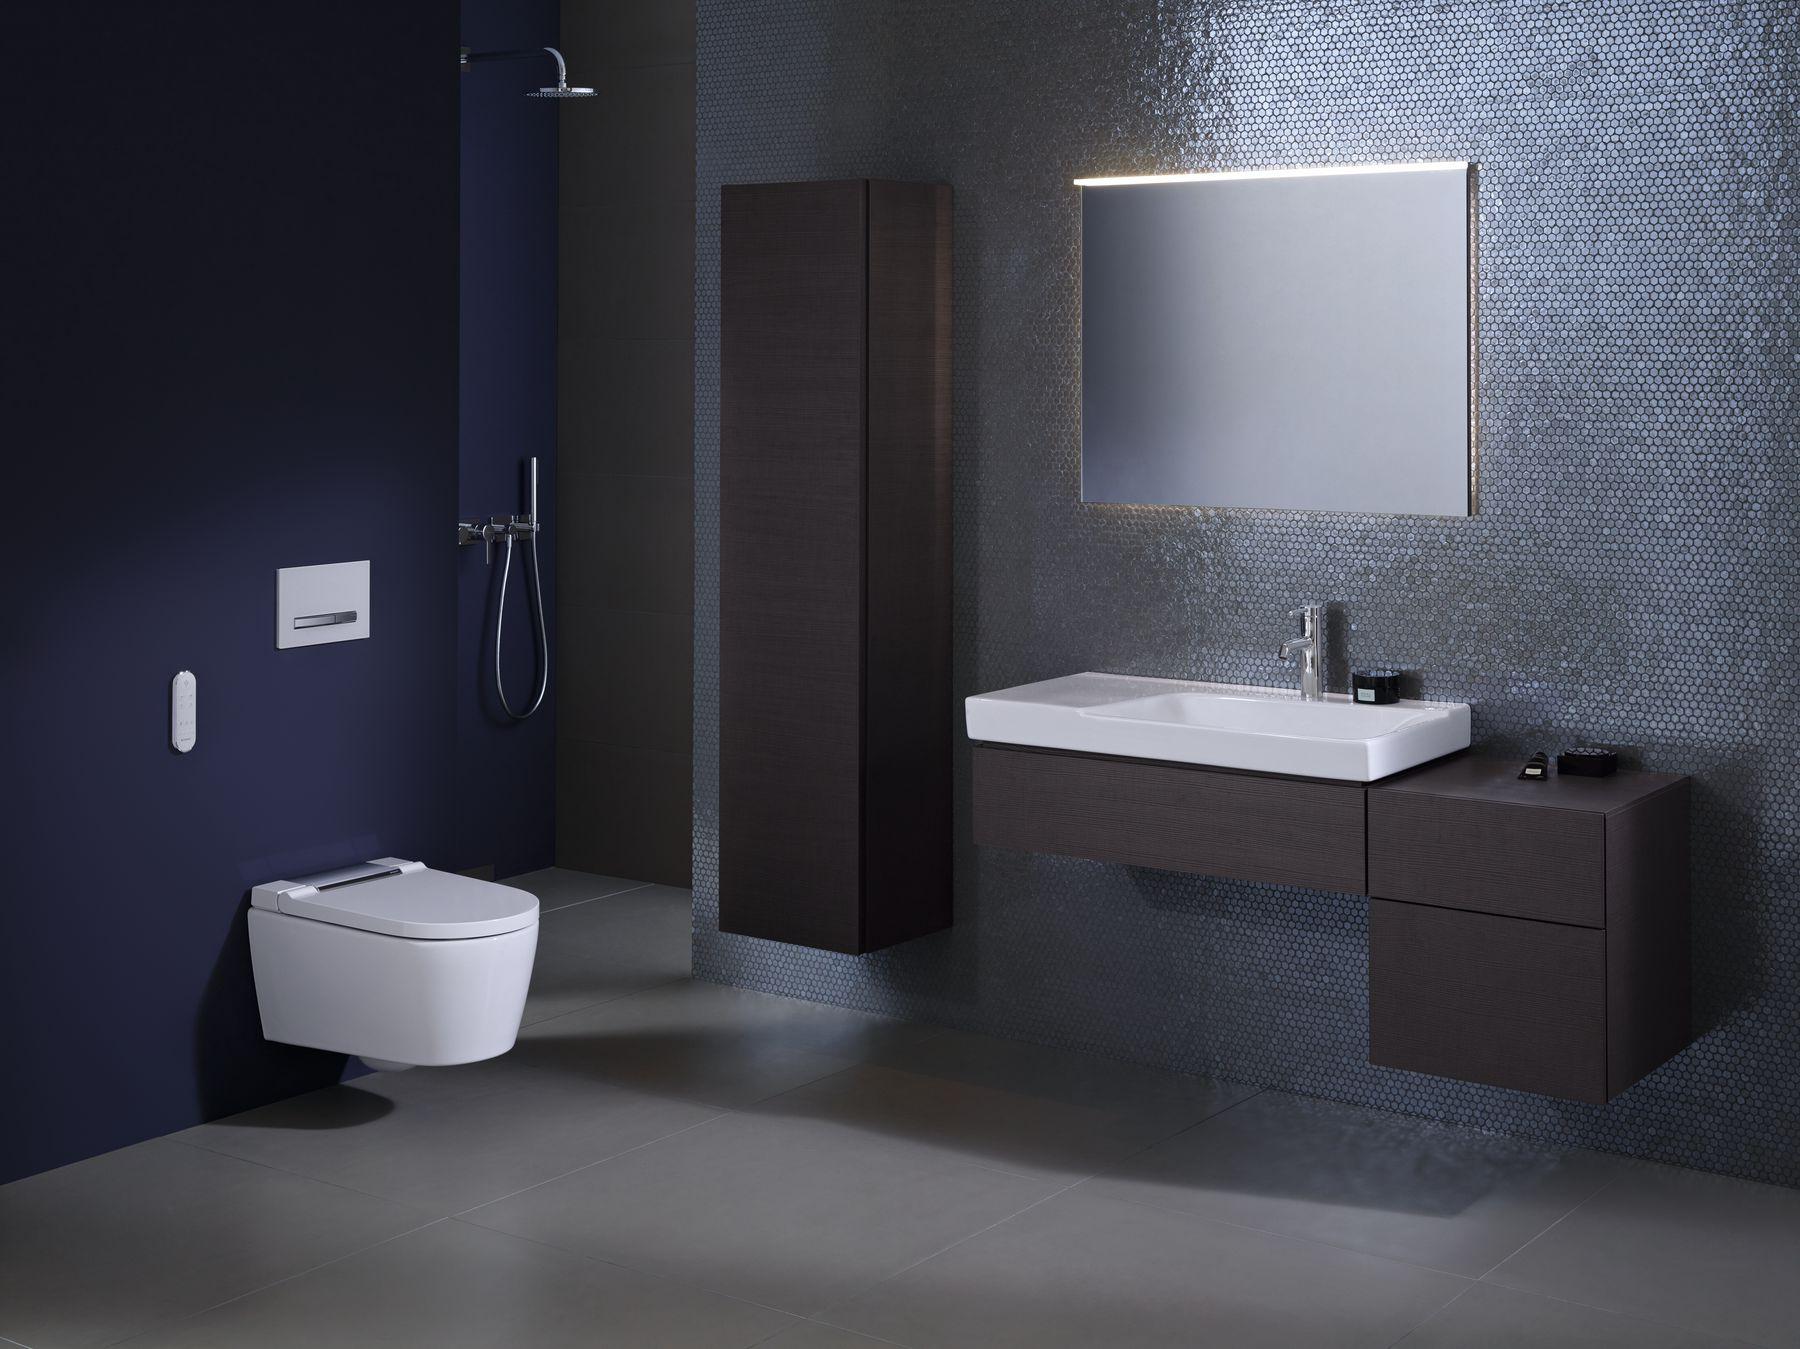 2019 Bathroom 07B B2 AquaClean Sela_bigview